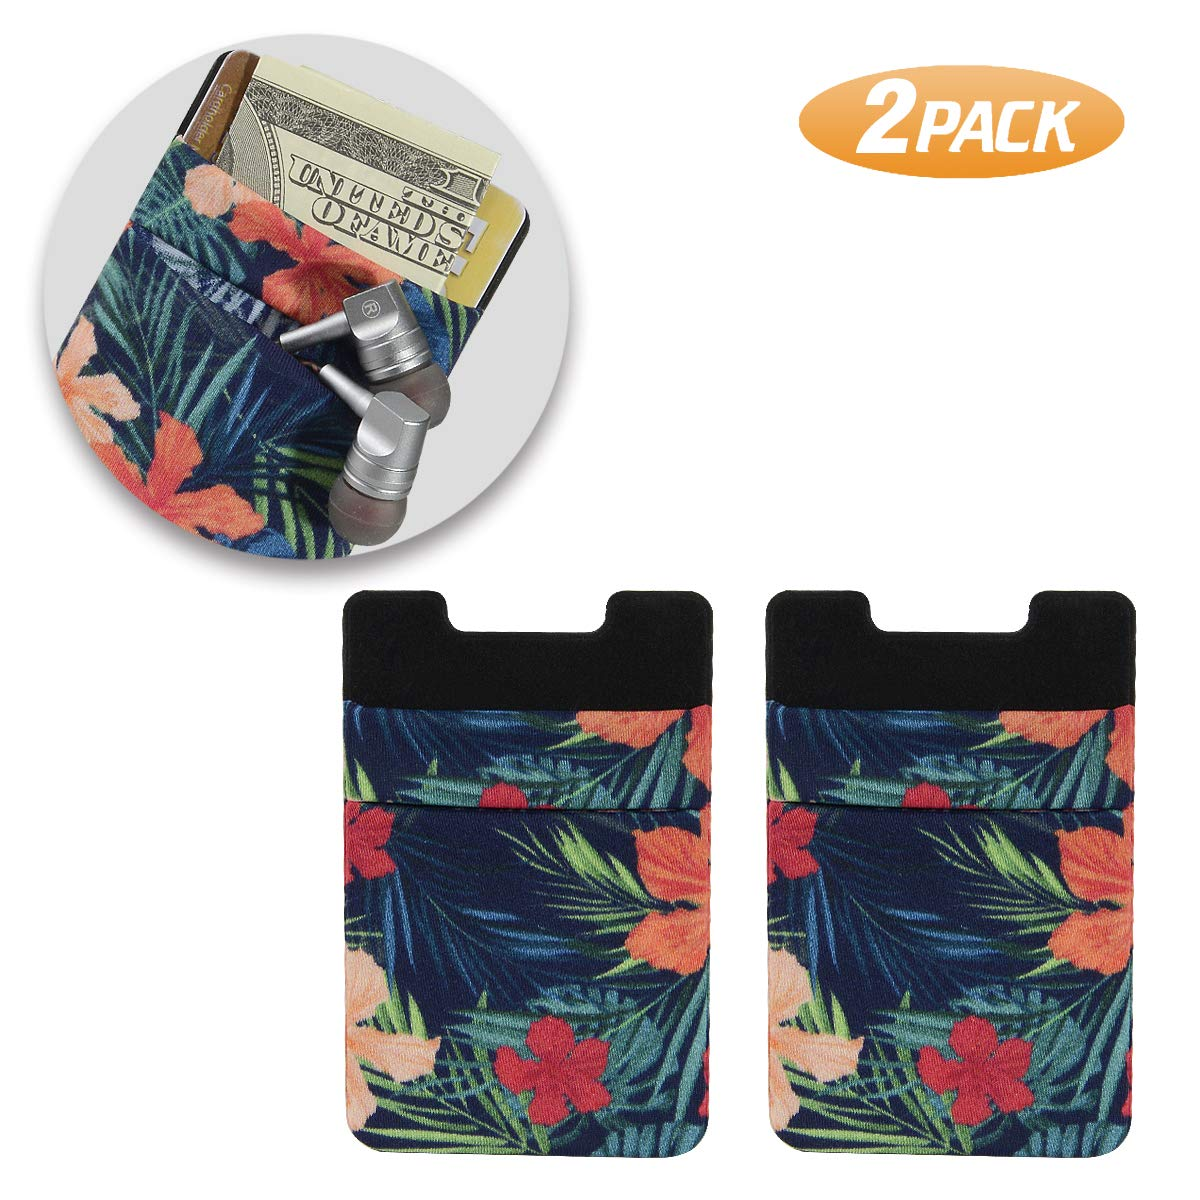 Black Phone Card Holder 2 Packs SHANSHUI Double Secure Lycra Spandex Slim Adhesive Credit Card Holder Case Stick On Pouch for Smart Phones - 2 Packs